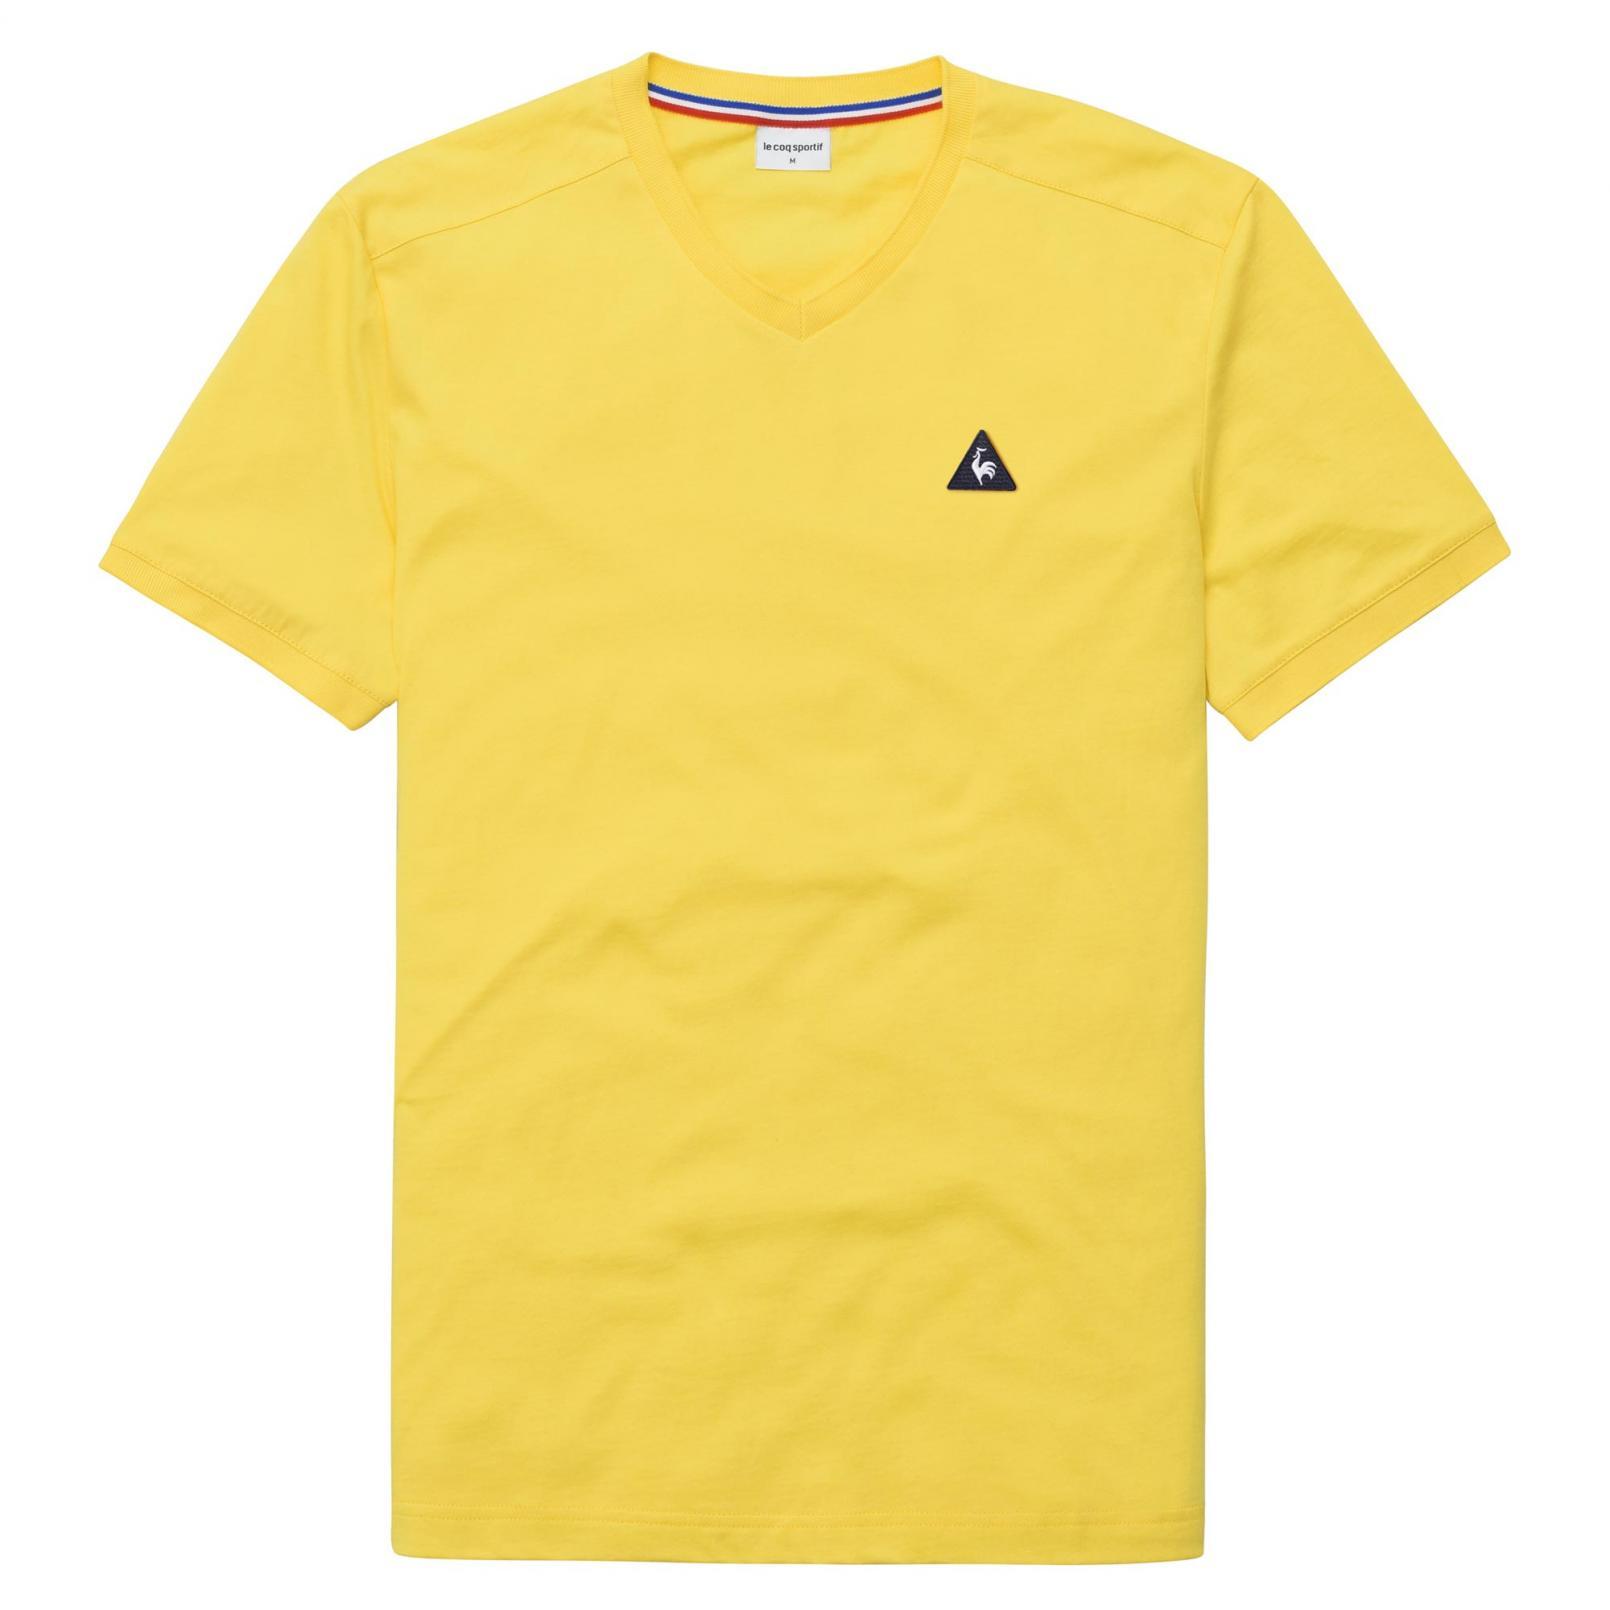 T-shirts – Le Coq Sportif Essentiels T-shirt Yellow